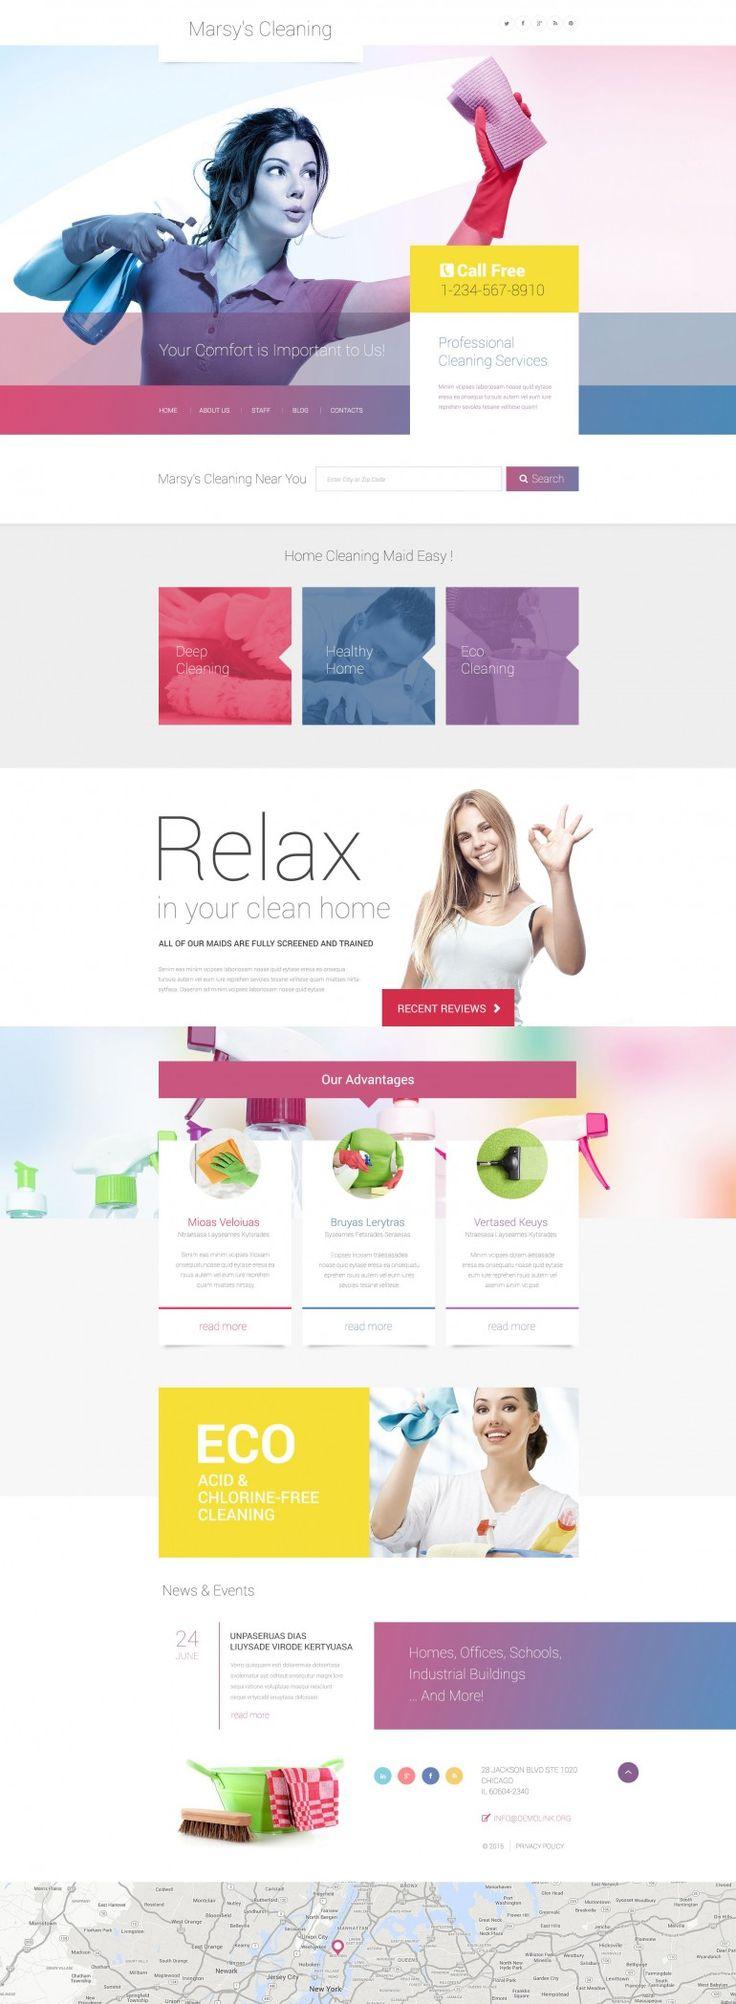 about web design on pinterest website design layout web design